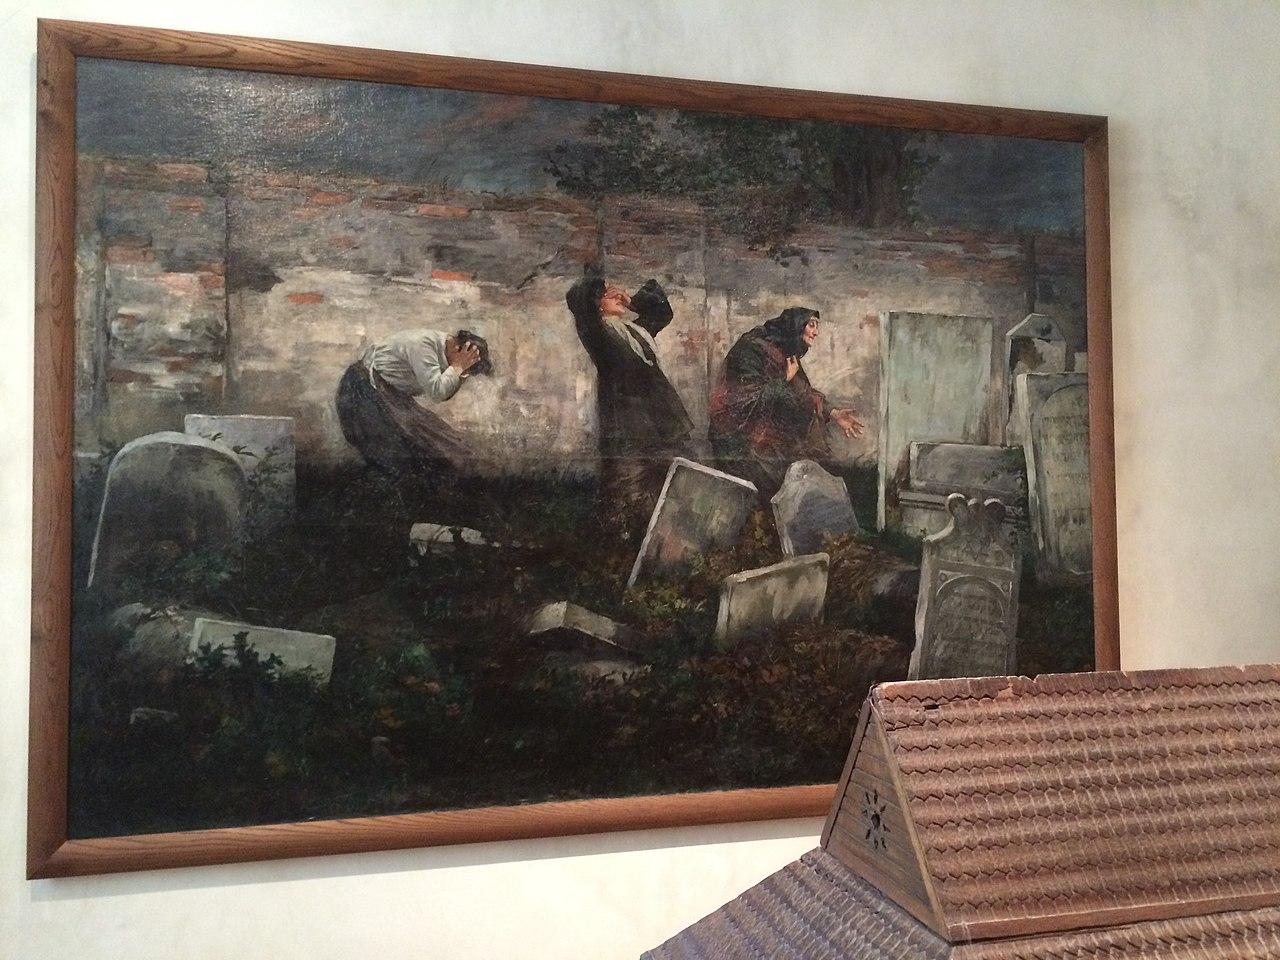 file cimeti re juif tableau de samuel hirszenberg lodz 1892 jpg wikipedia. Black Bedroom Furniture Sets. Home Design Ideas